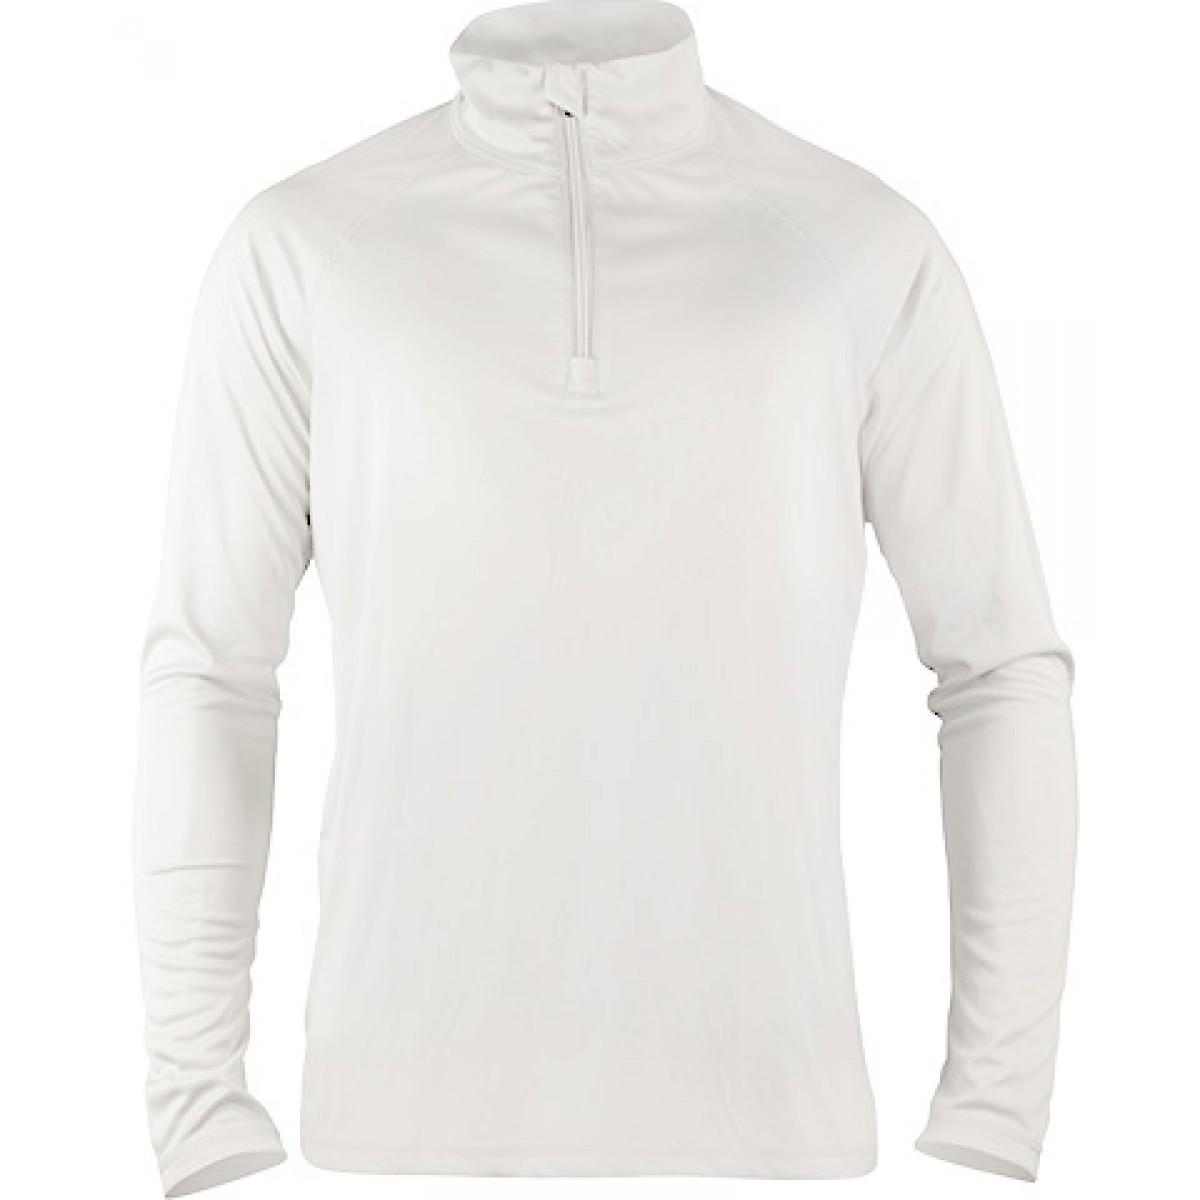 Quarter-Zip Lightweight Pullover-White-XS